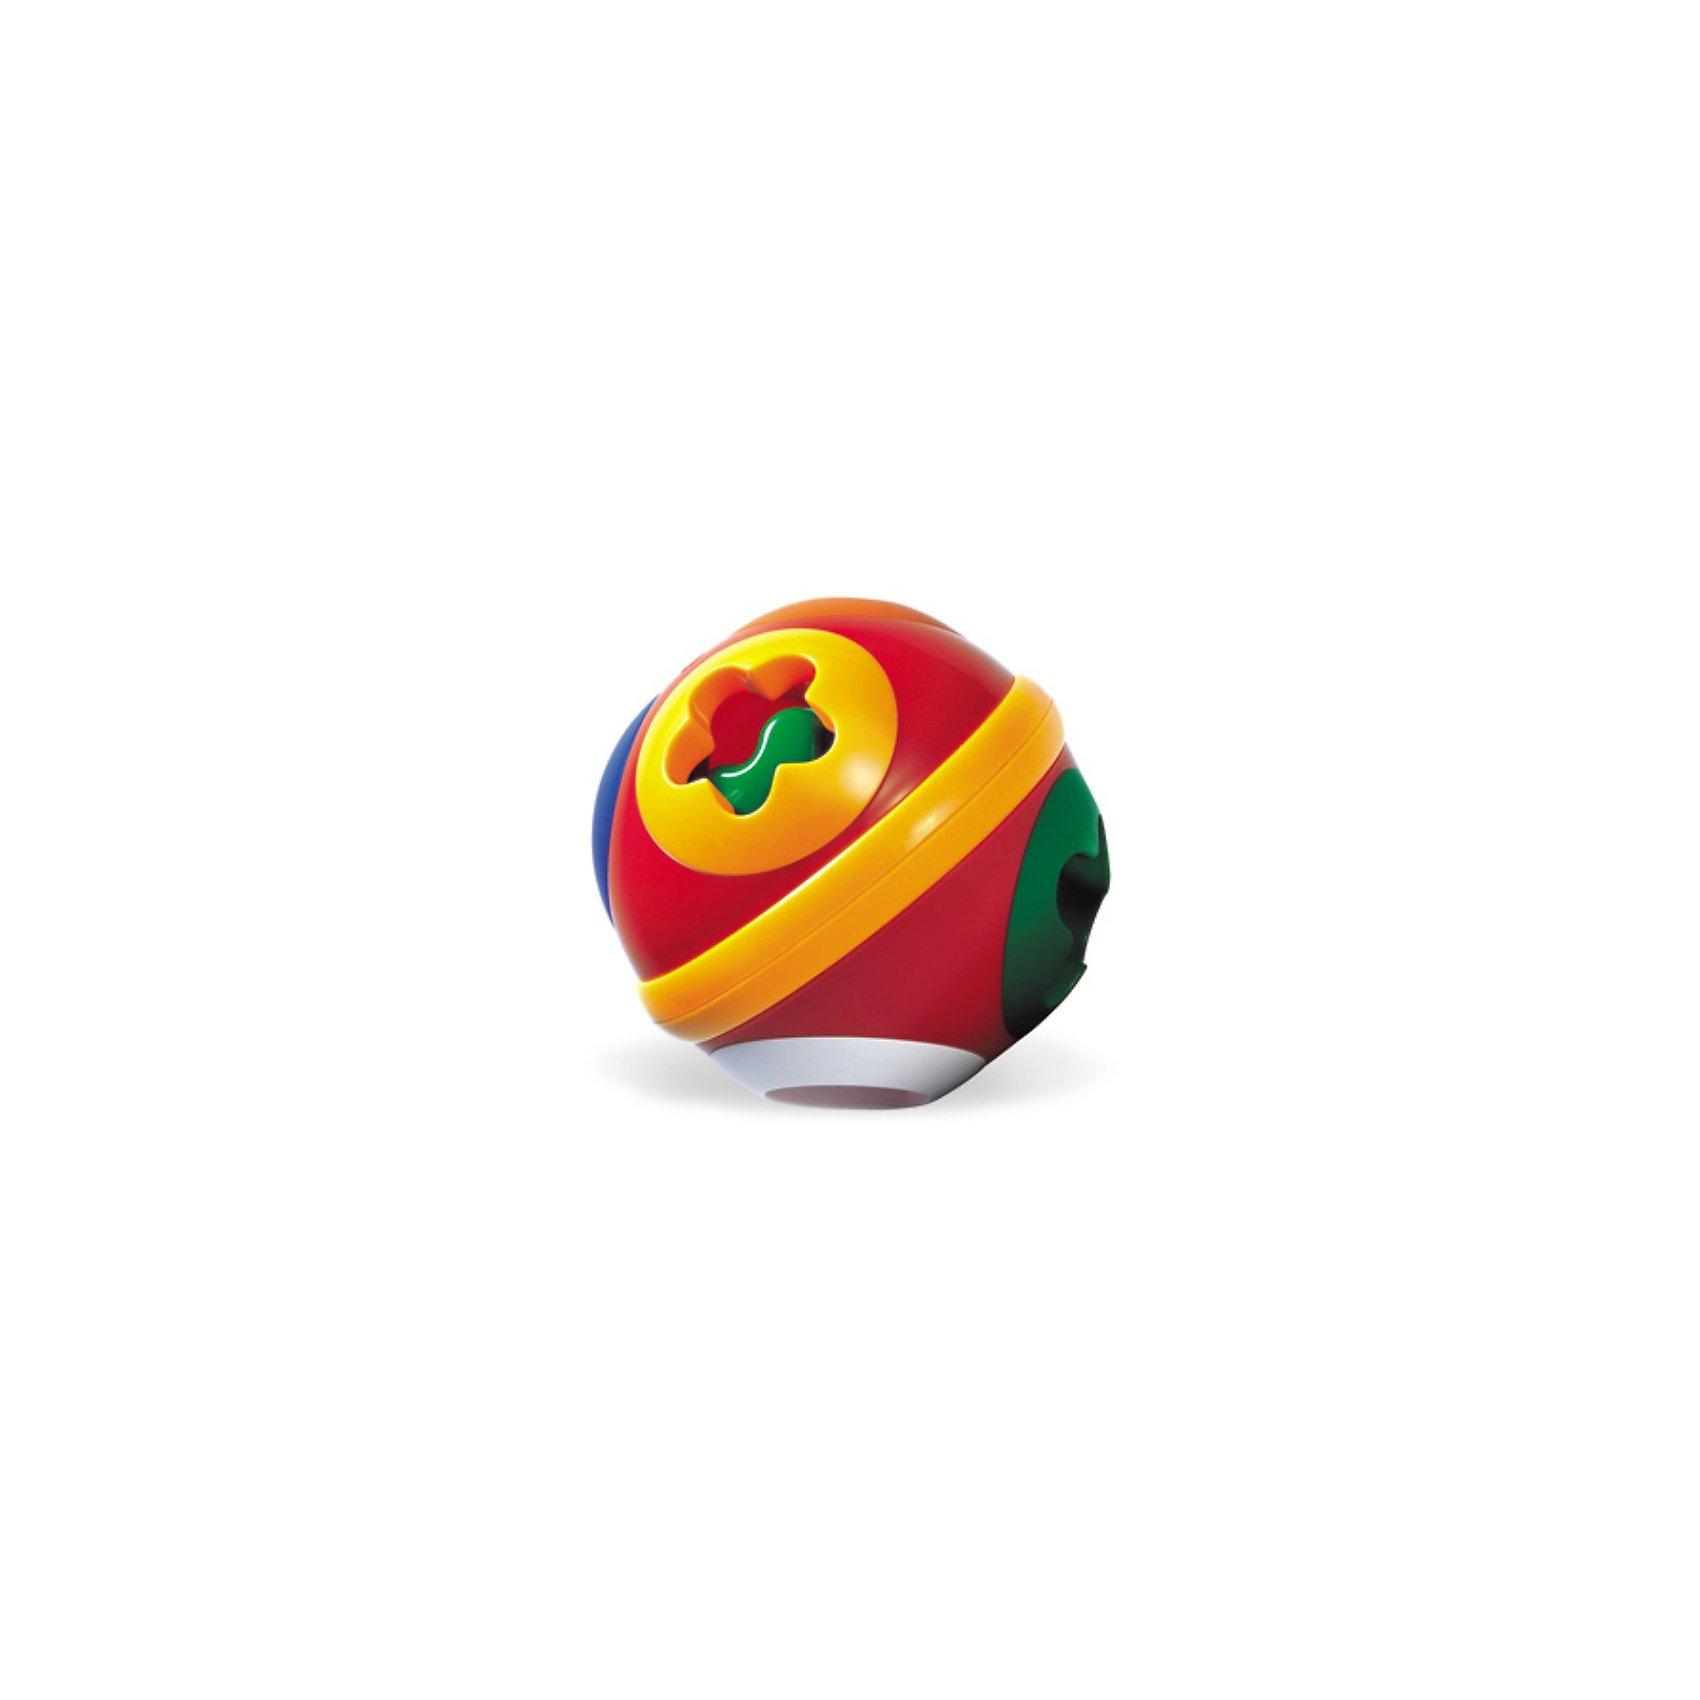 TOLO TOLO Развивающая игра Формочки (вращающийся шар) набор развивающий tolo toys динозавры